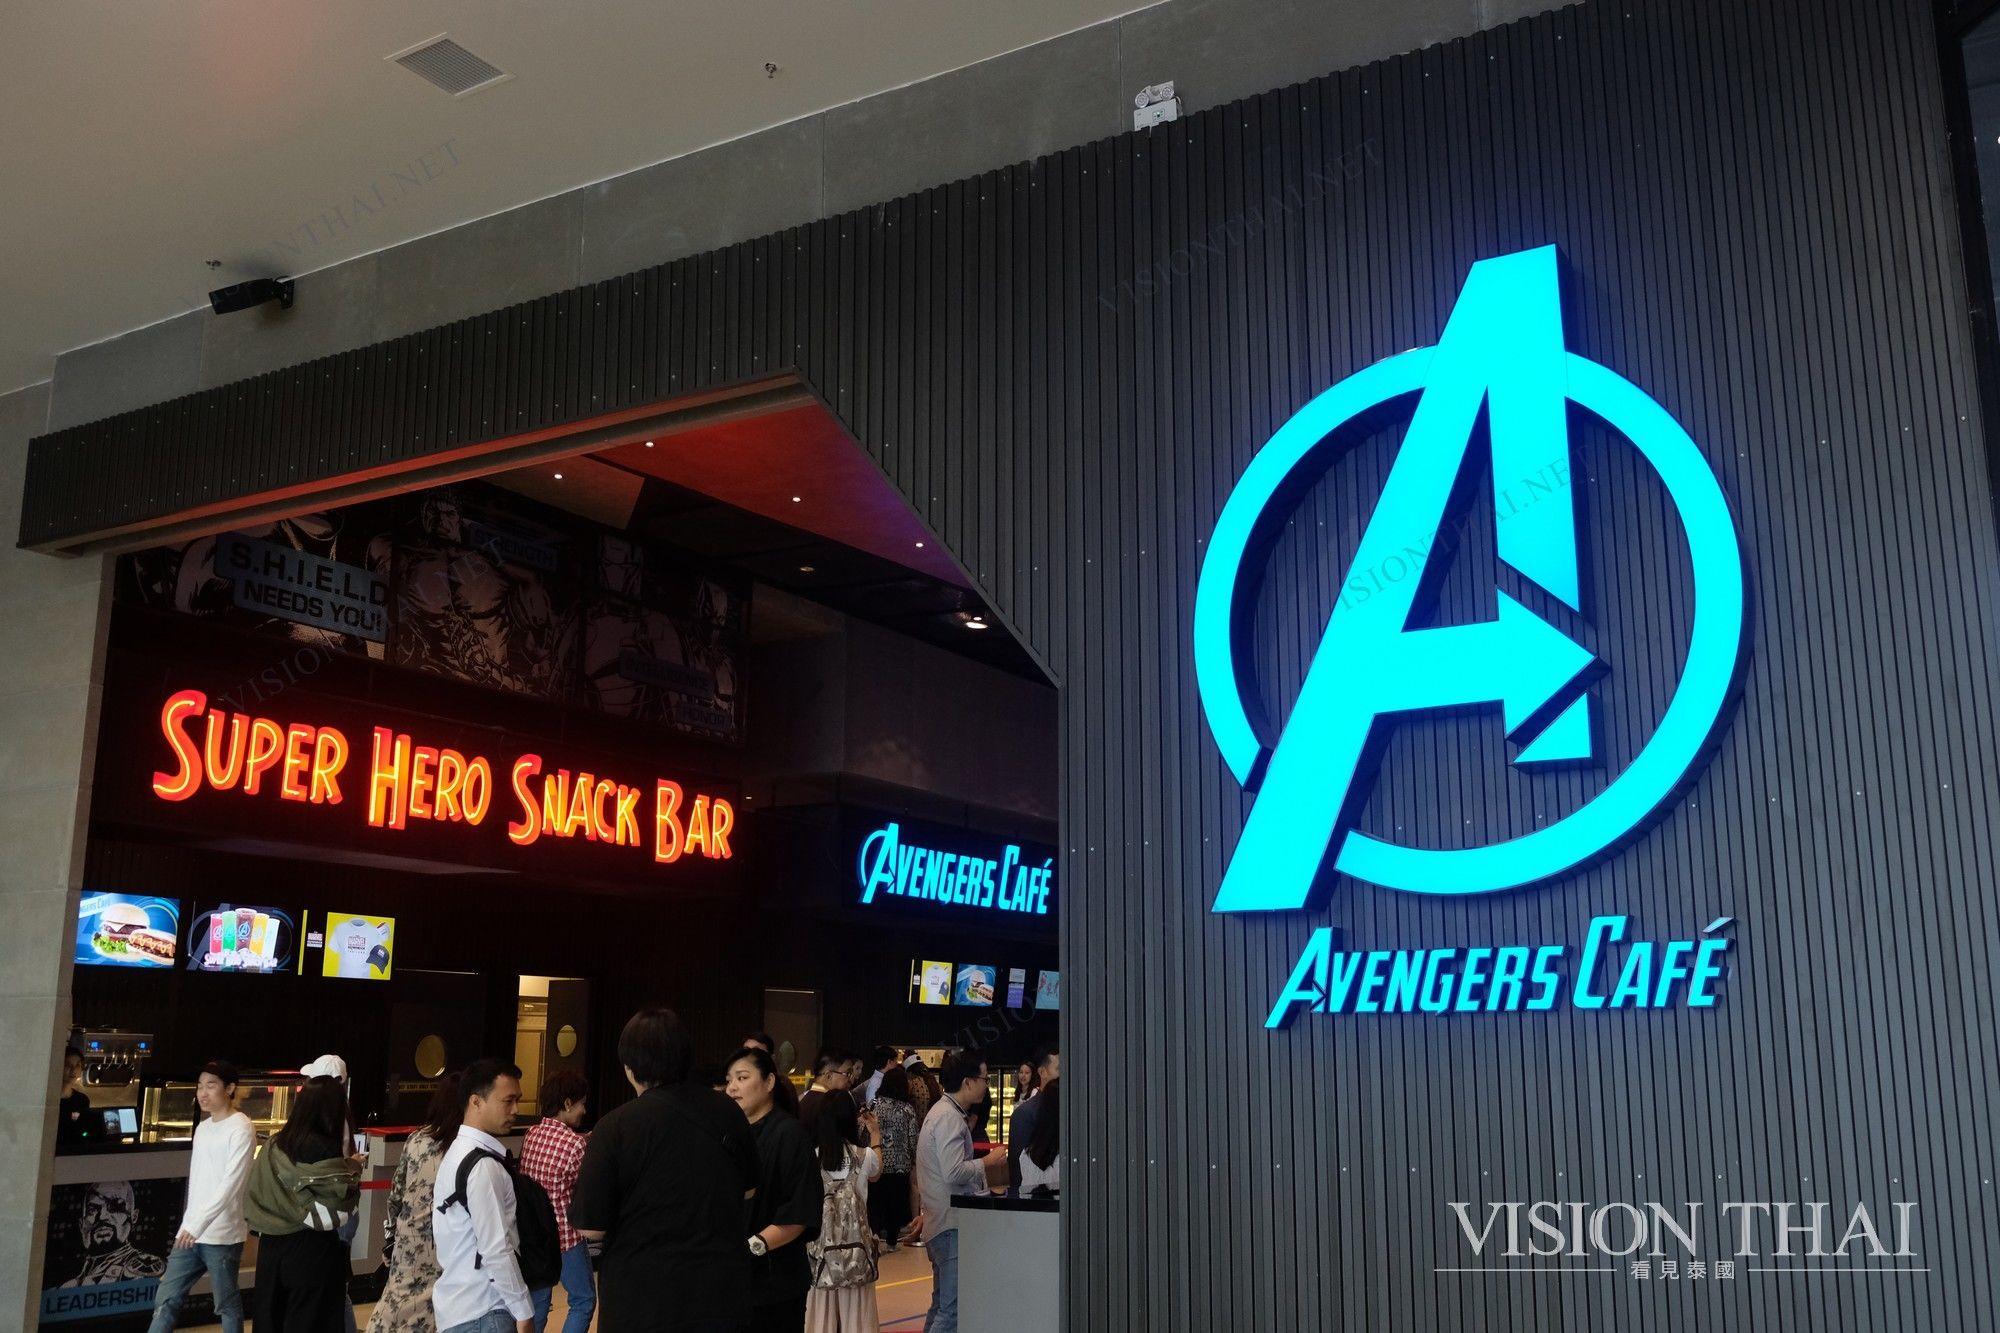 泰國漫威基地 Marvel marvel experience 漫威英雄 marvel thailand 泰國 漫威